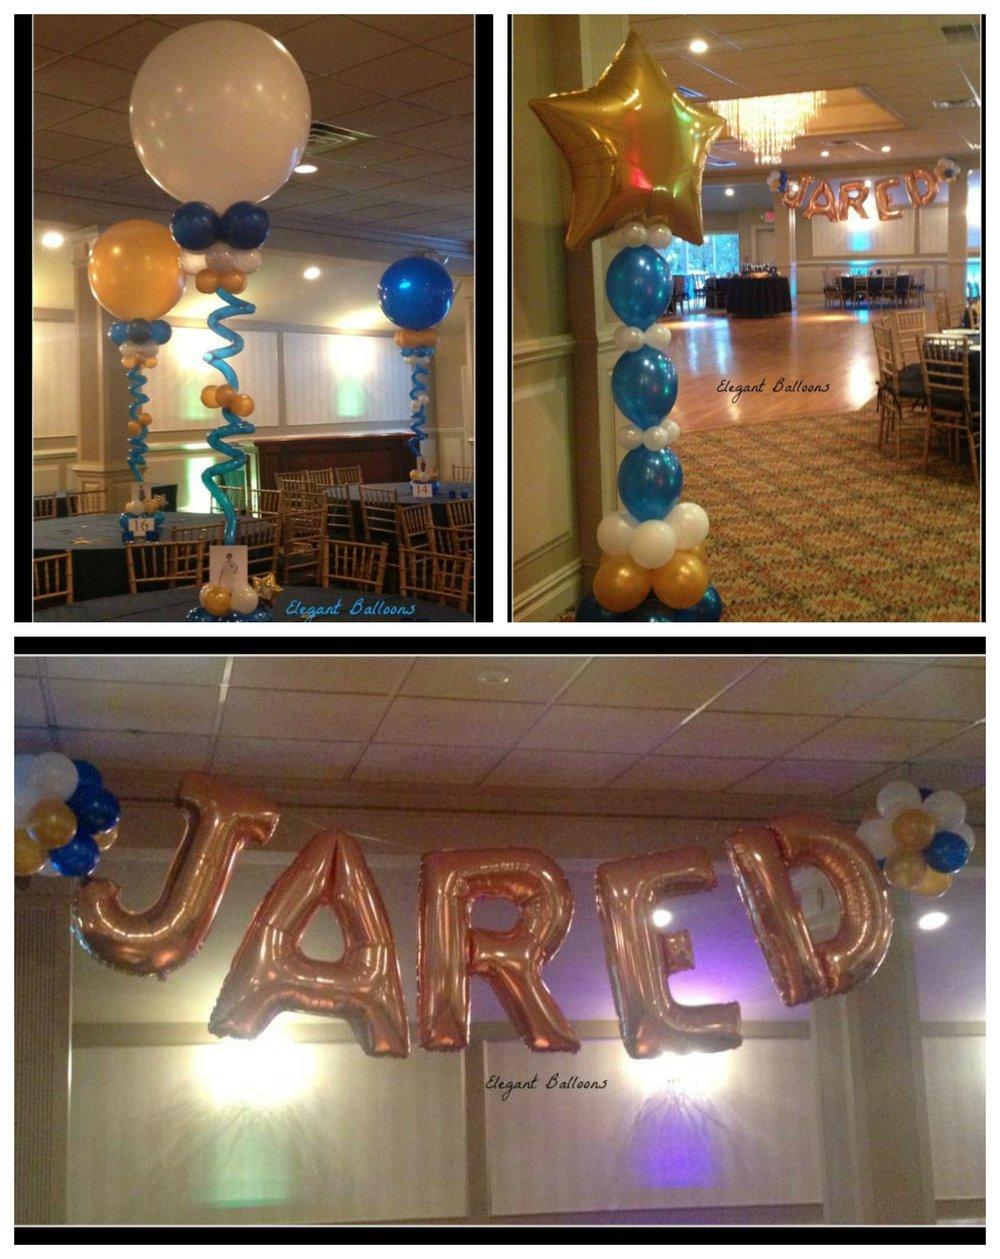 Jared's bar mitzvah